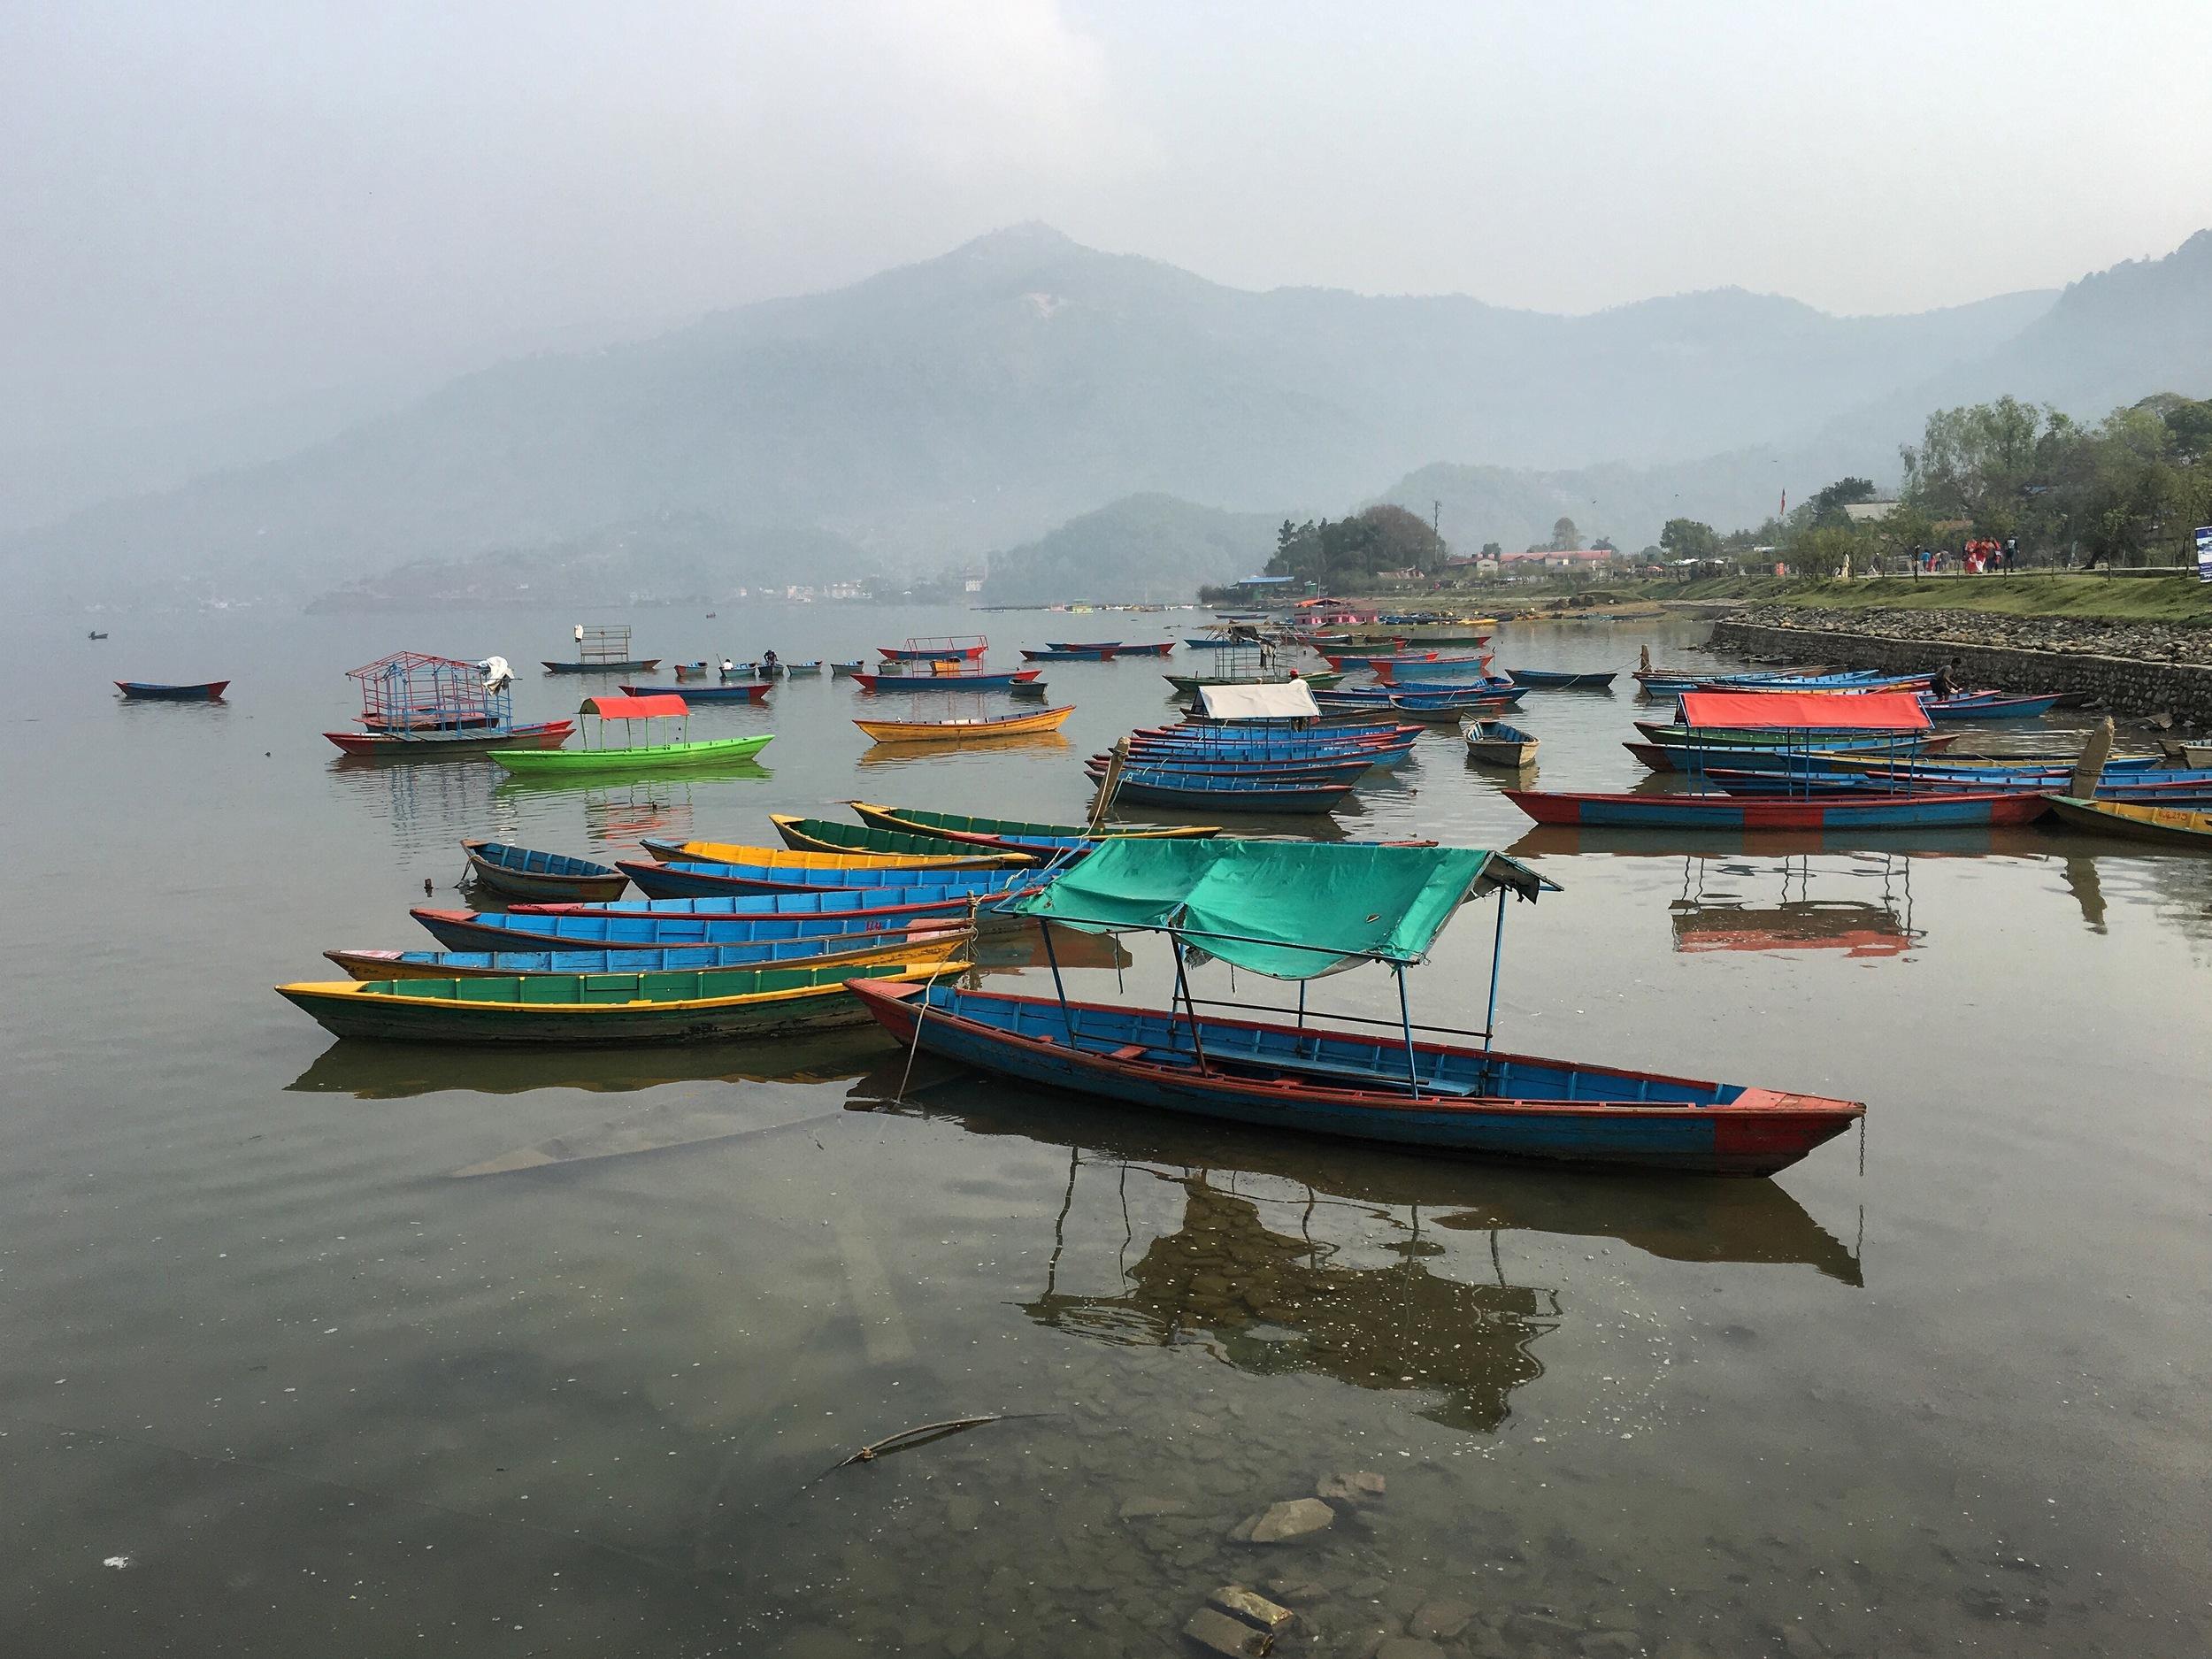 Boats in Phewa Lake, Pokhara